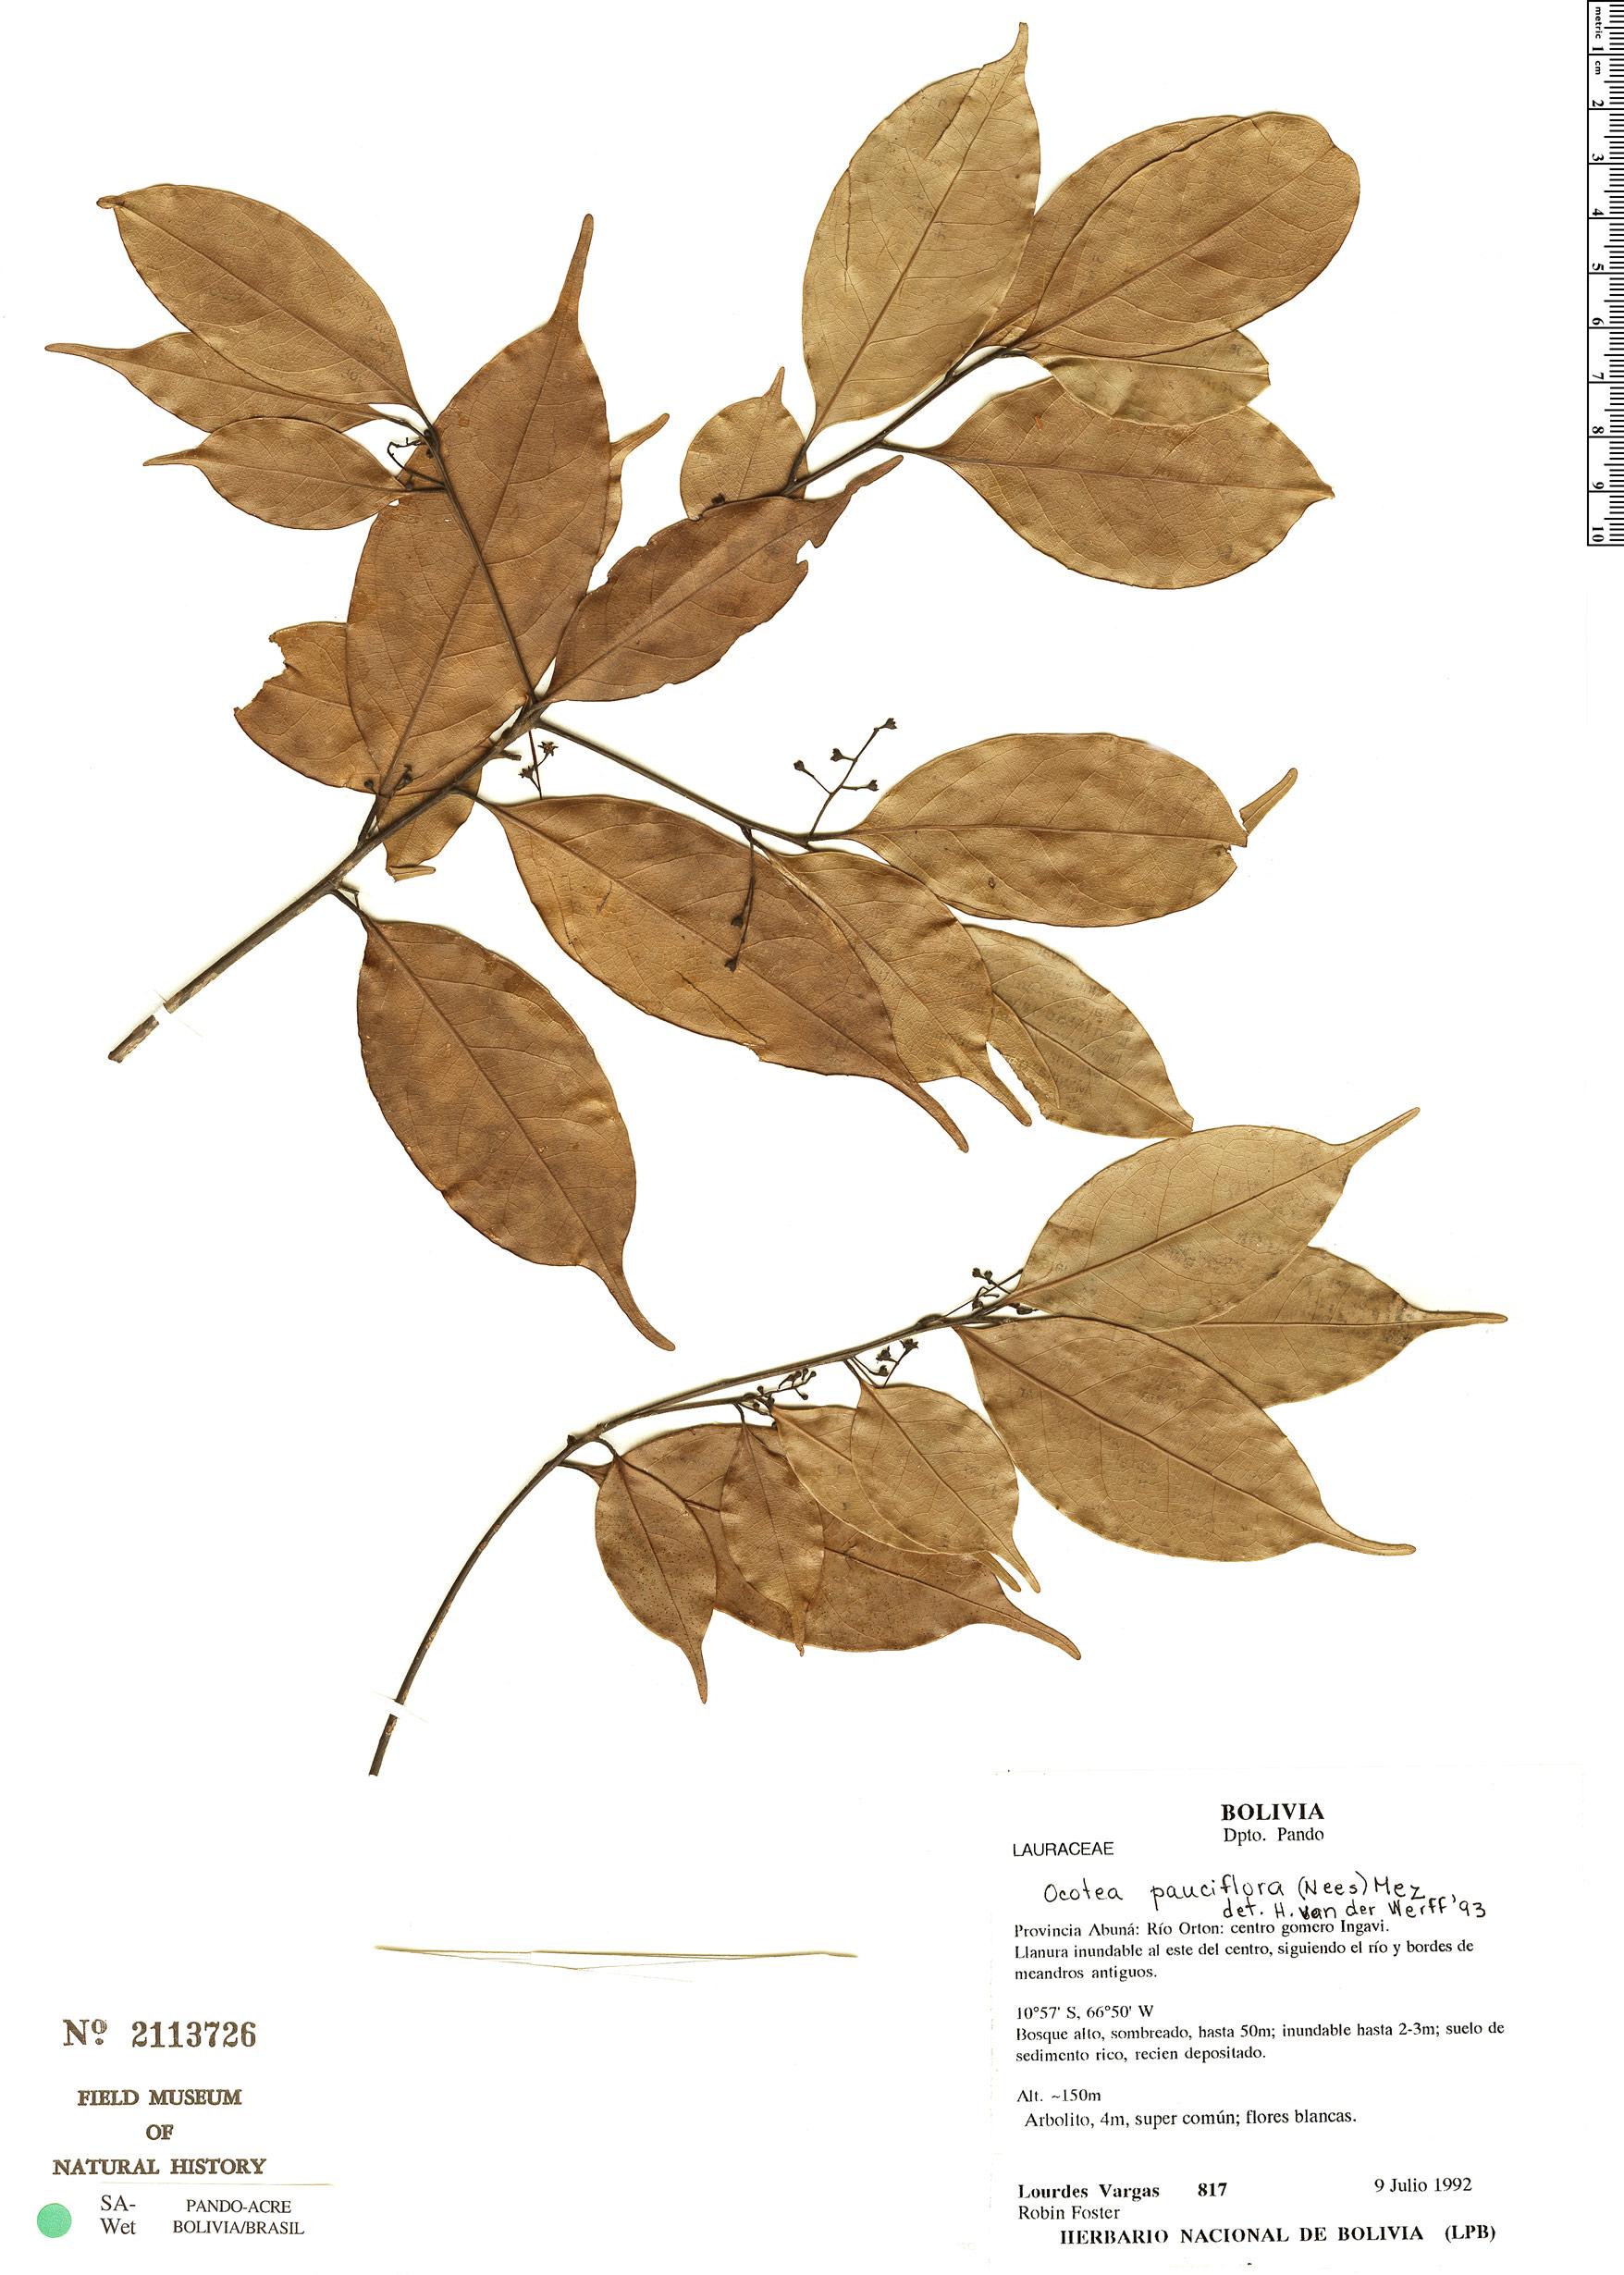 Specimen: Ocotea pauciflora